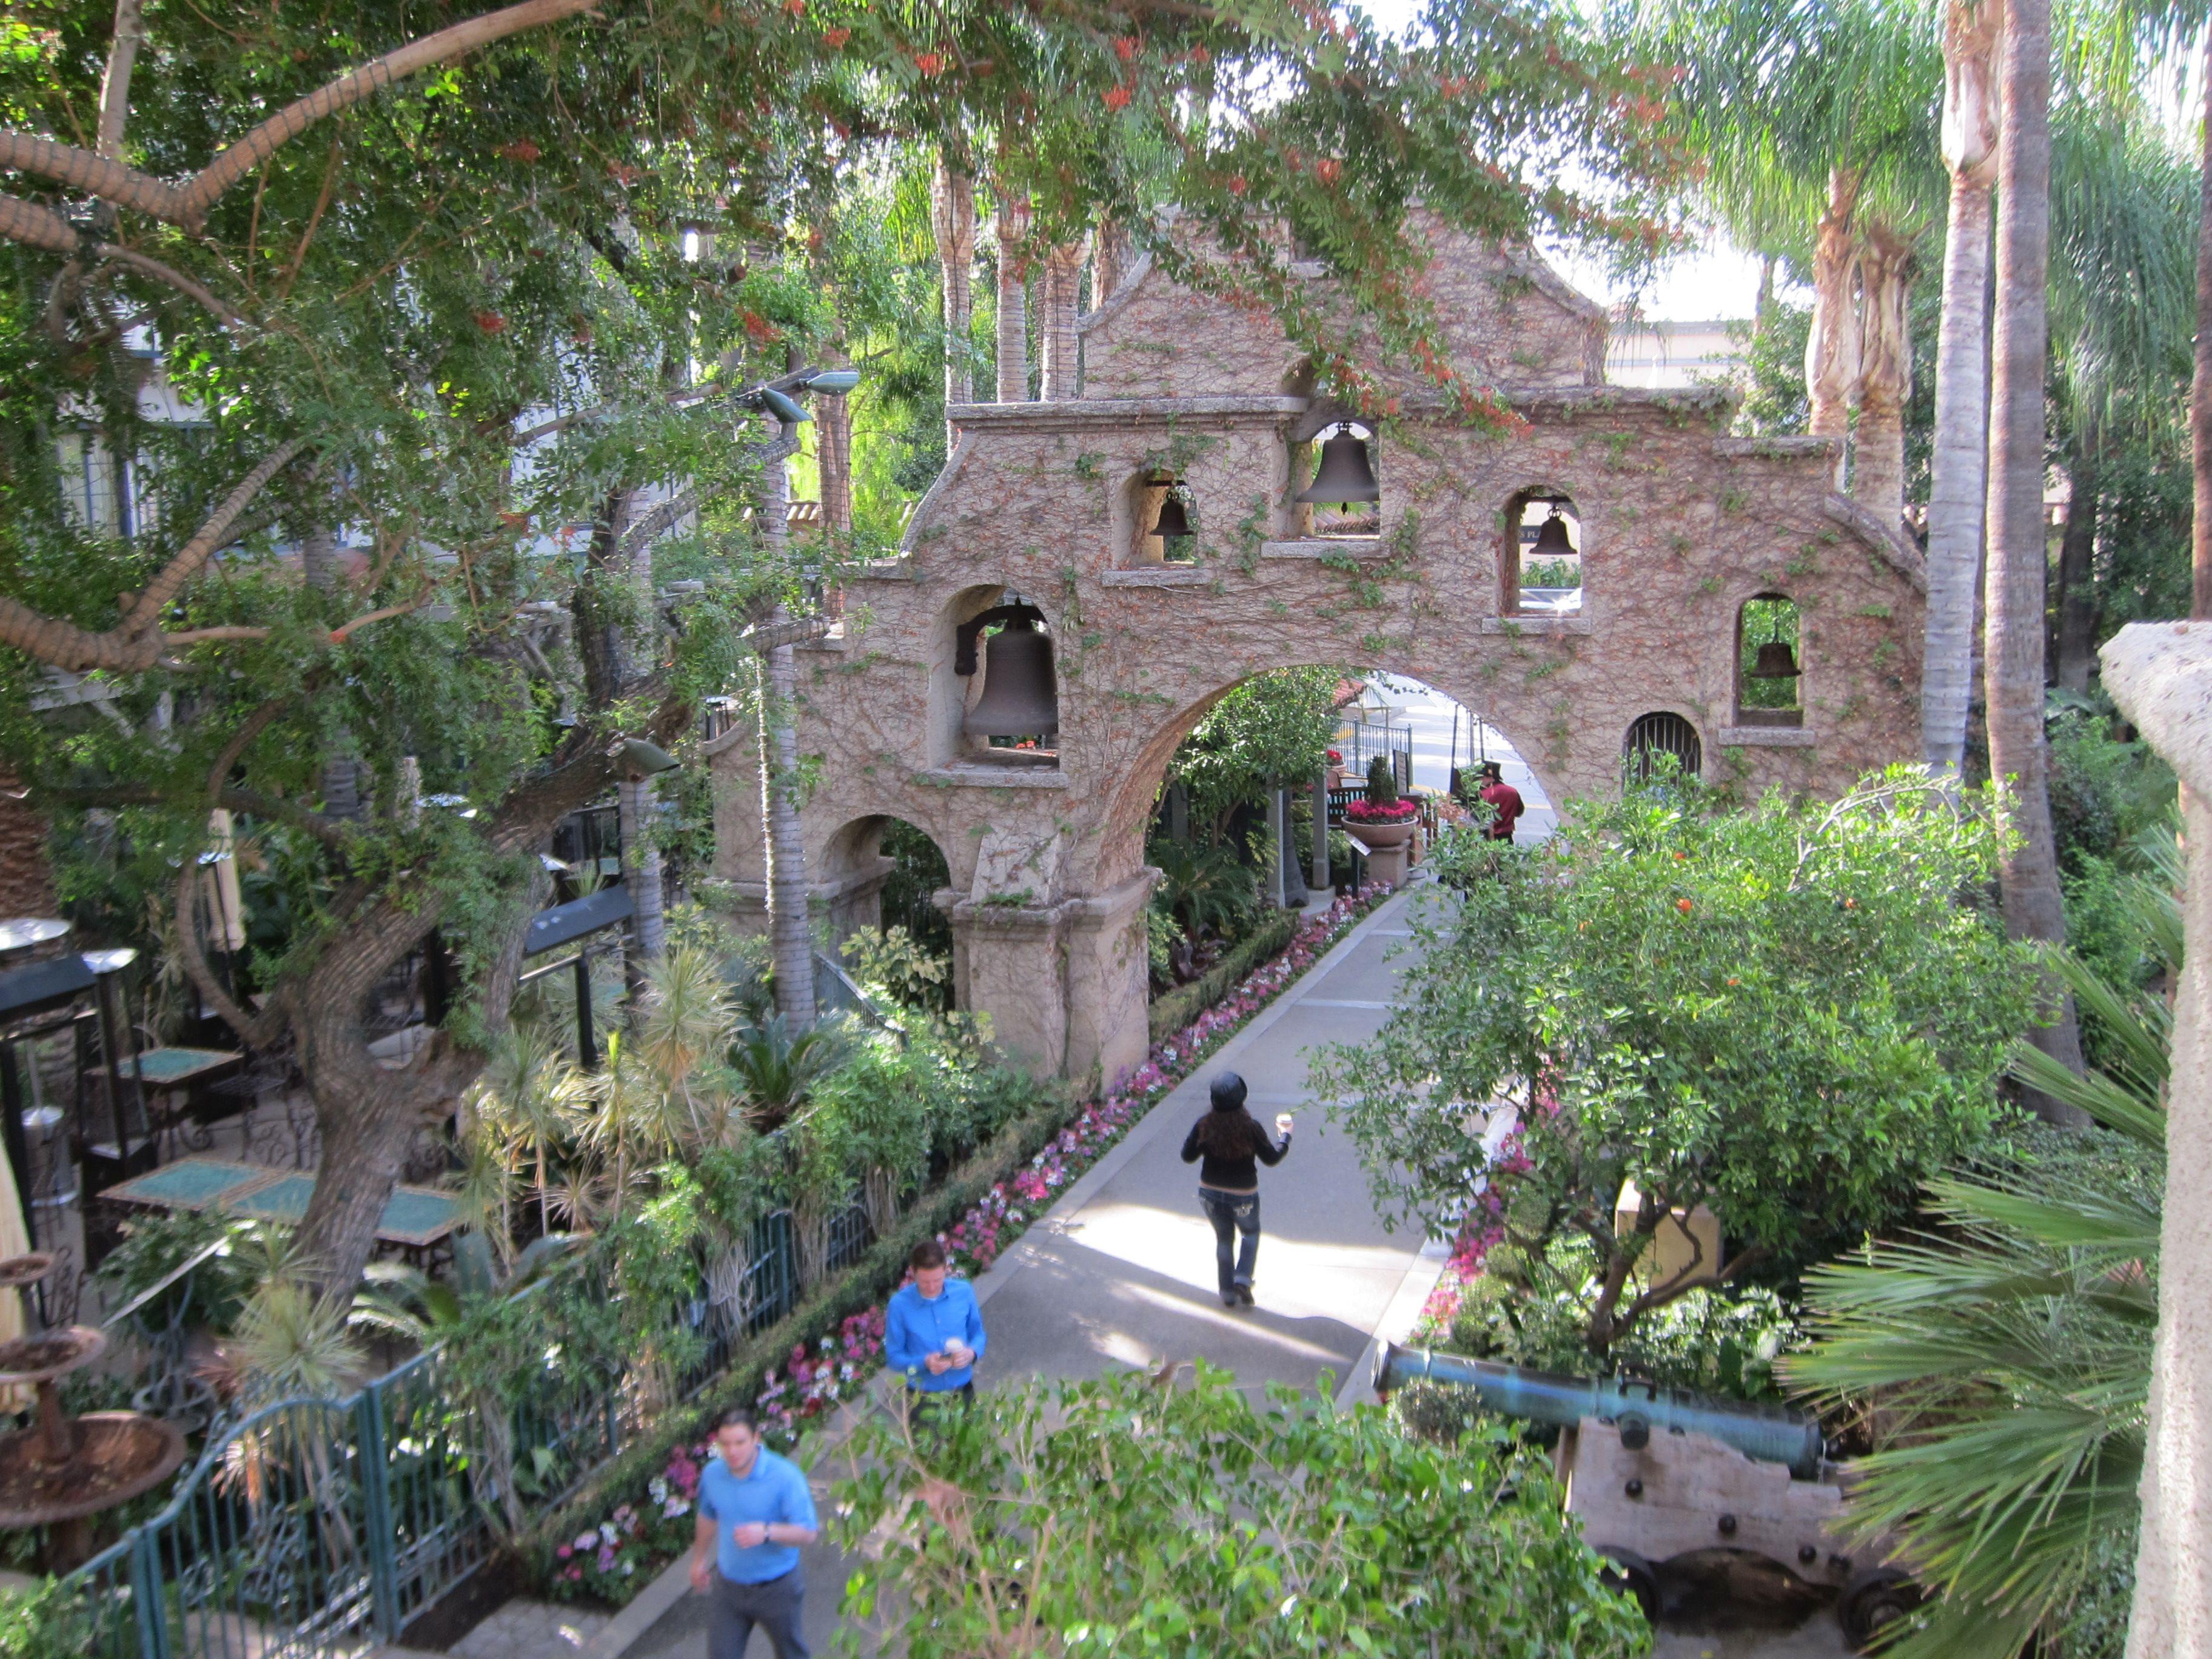 Entry of the ever-elegant historic Mission Inn, downtown Riverside.